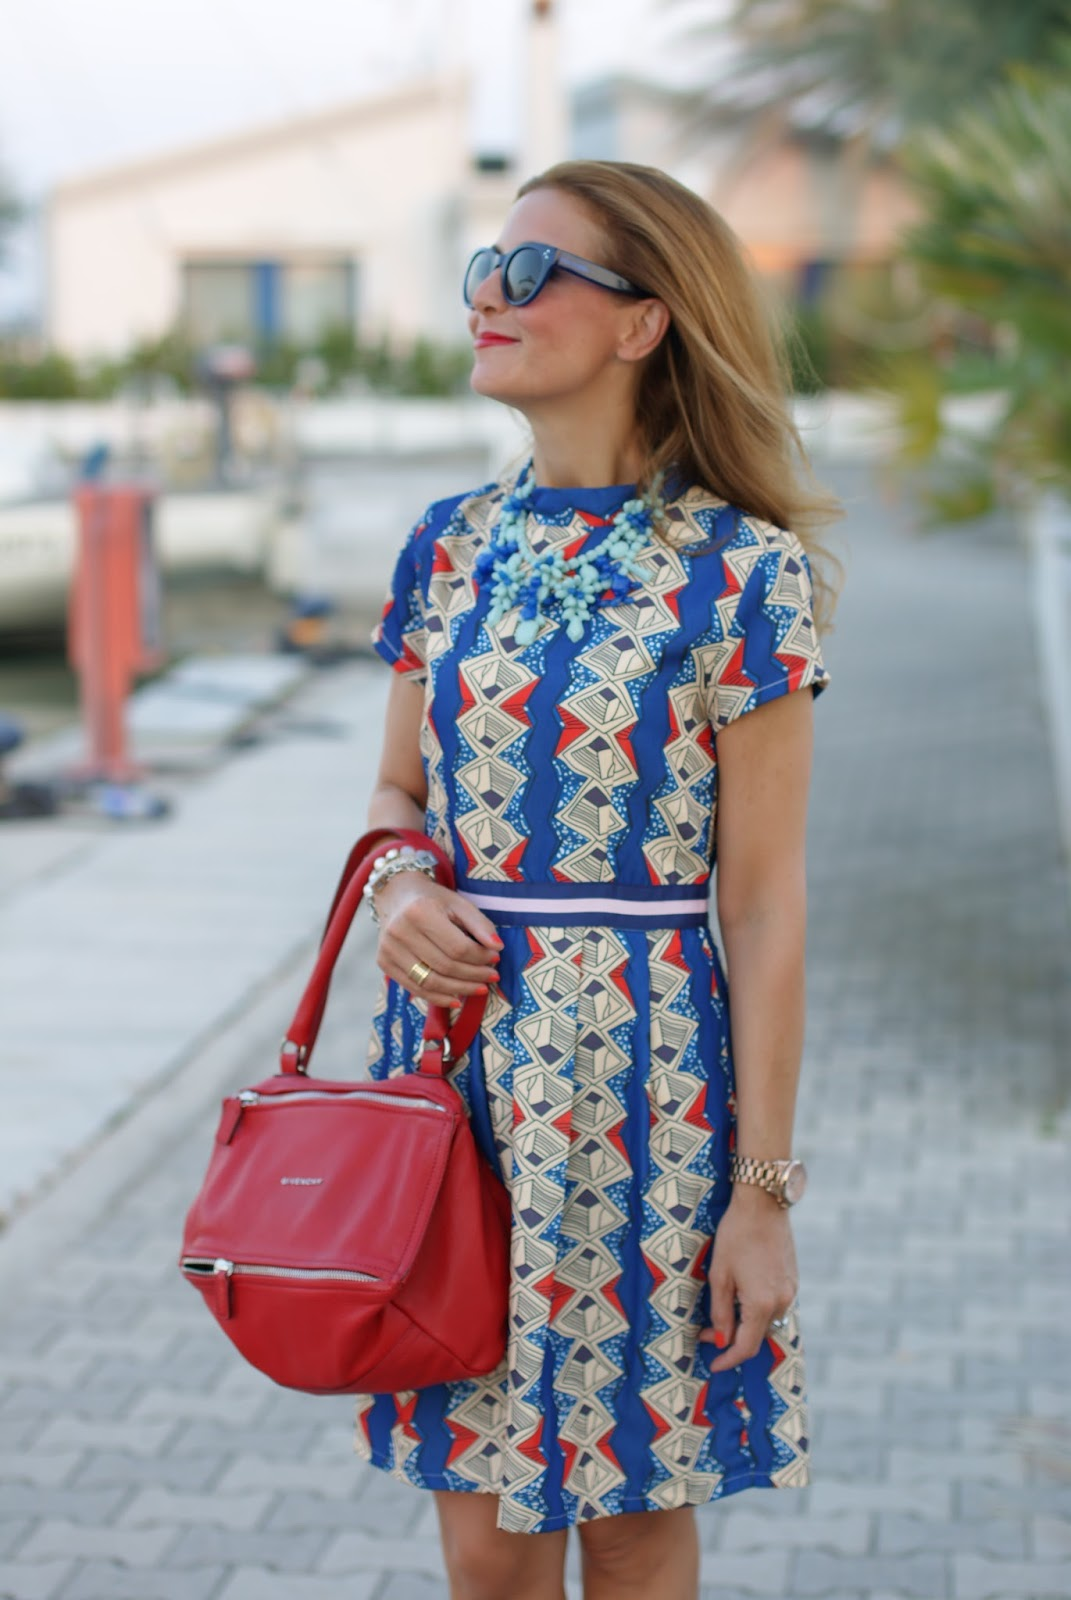 Zaful argyle print short dress, Givenchy Pandora bag in red and Nando Muzi suede slingbacks on Fashion and Cookies fashion blog, fashion blogger style